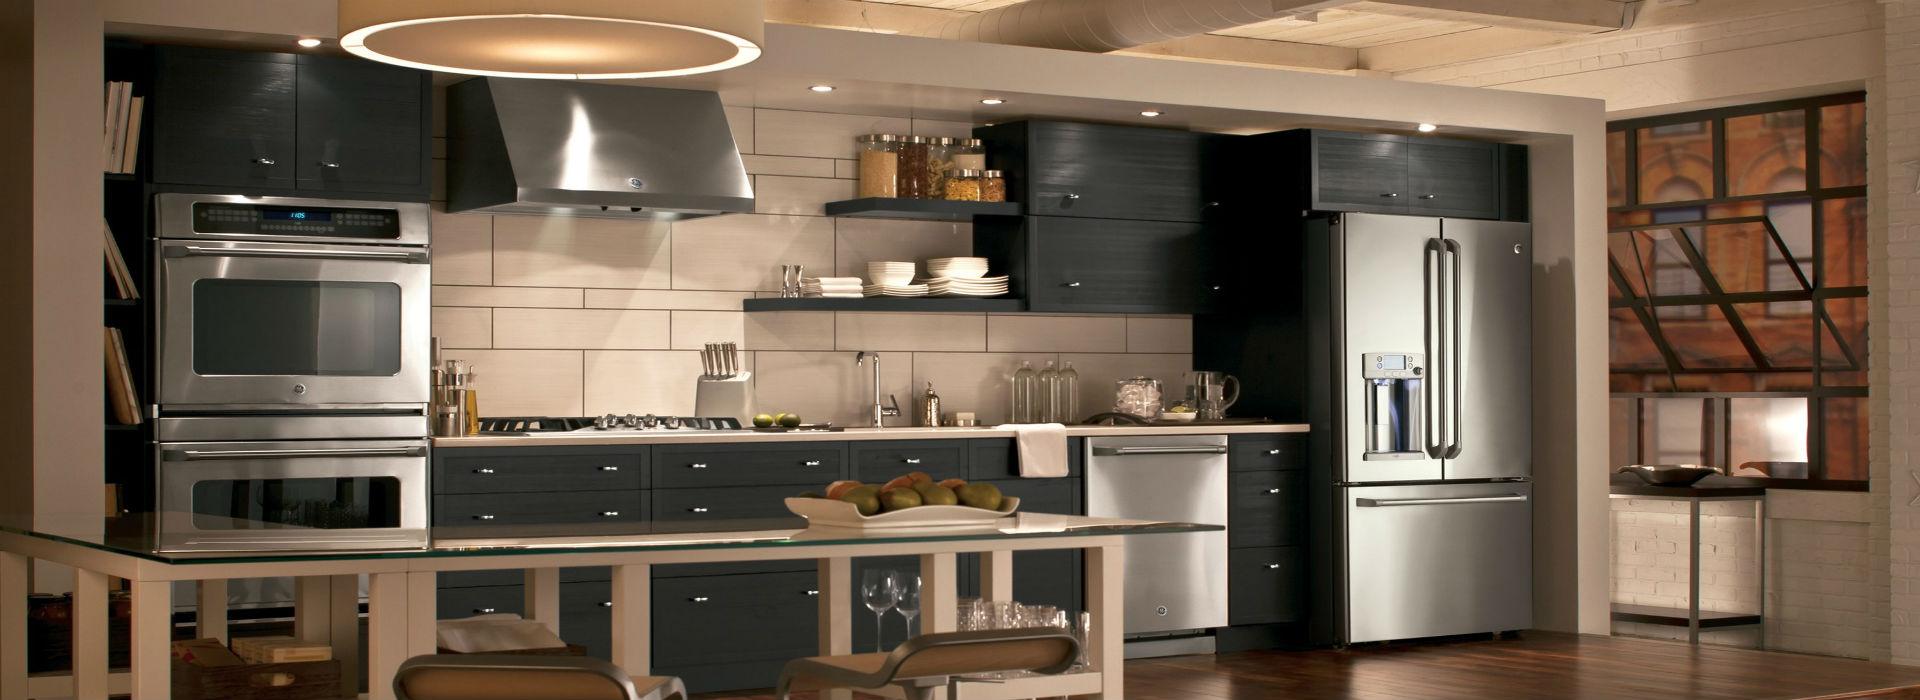 US Kitchen Appliances Repairs